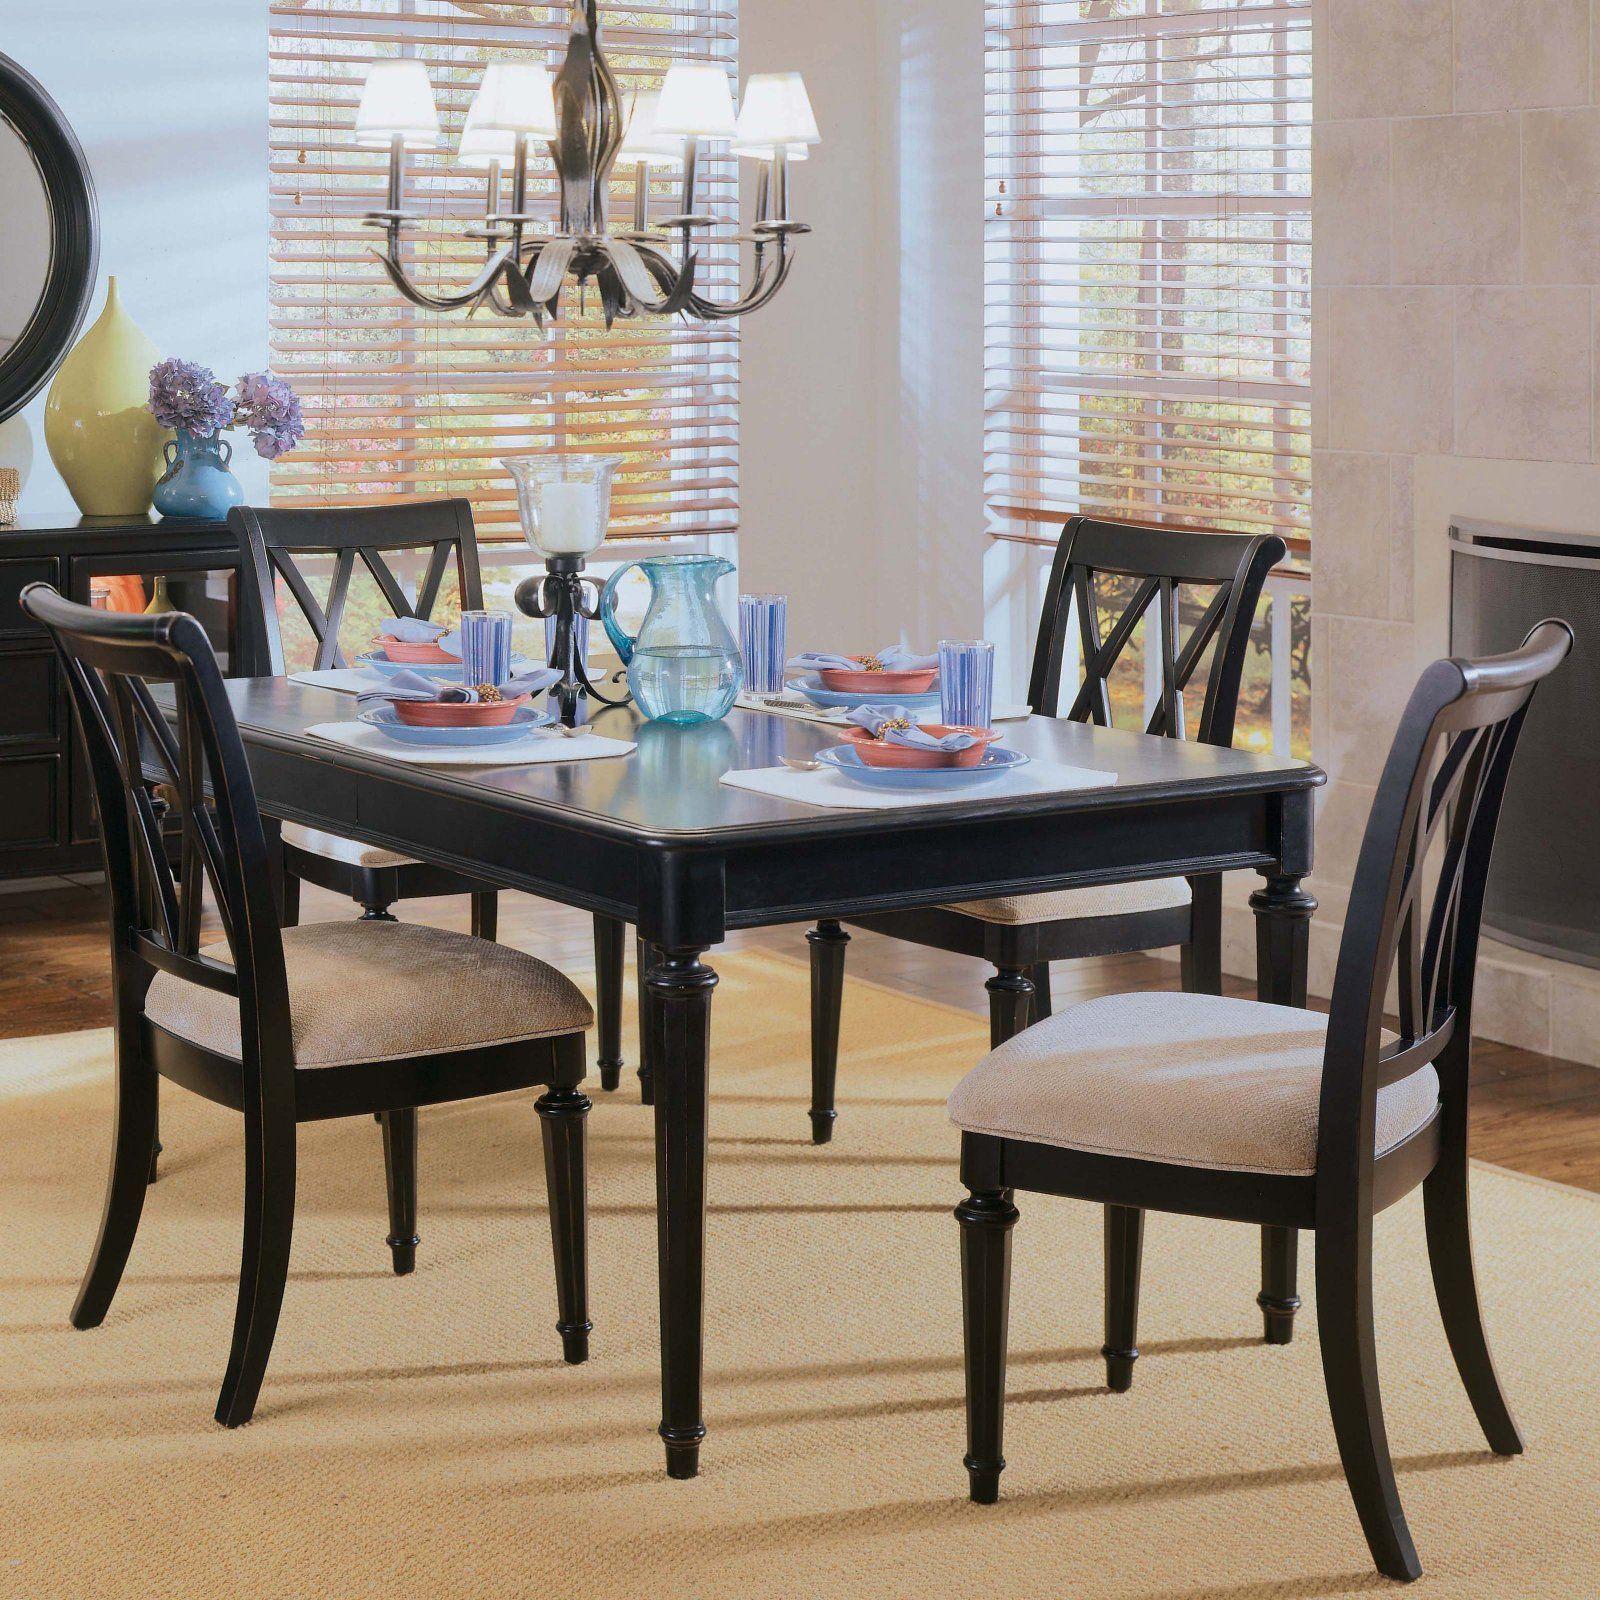 Reupholster These American Drew Camden Splat Back Dining Side